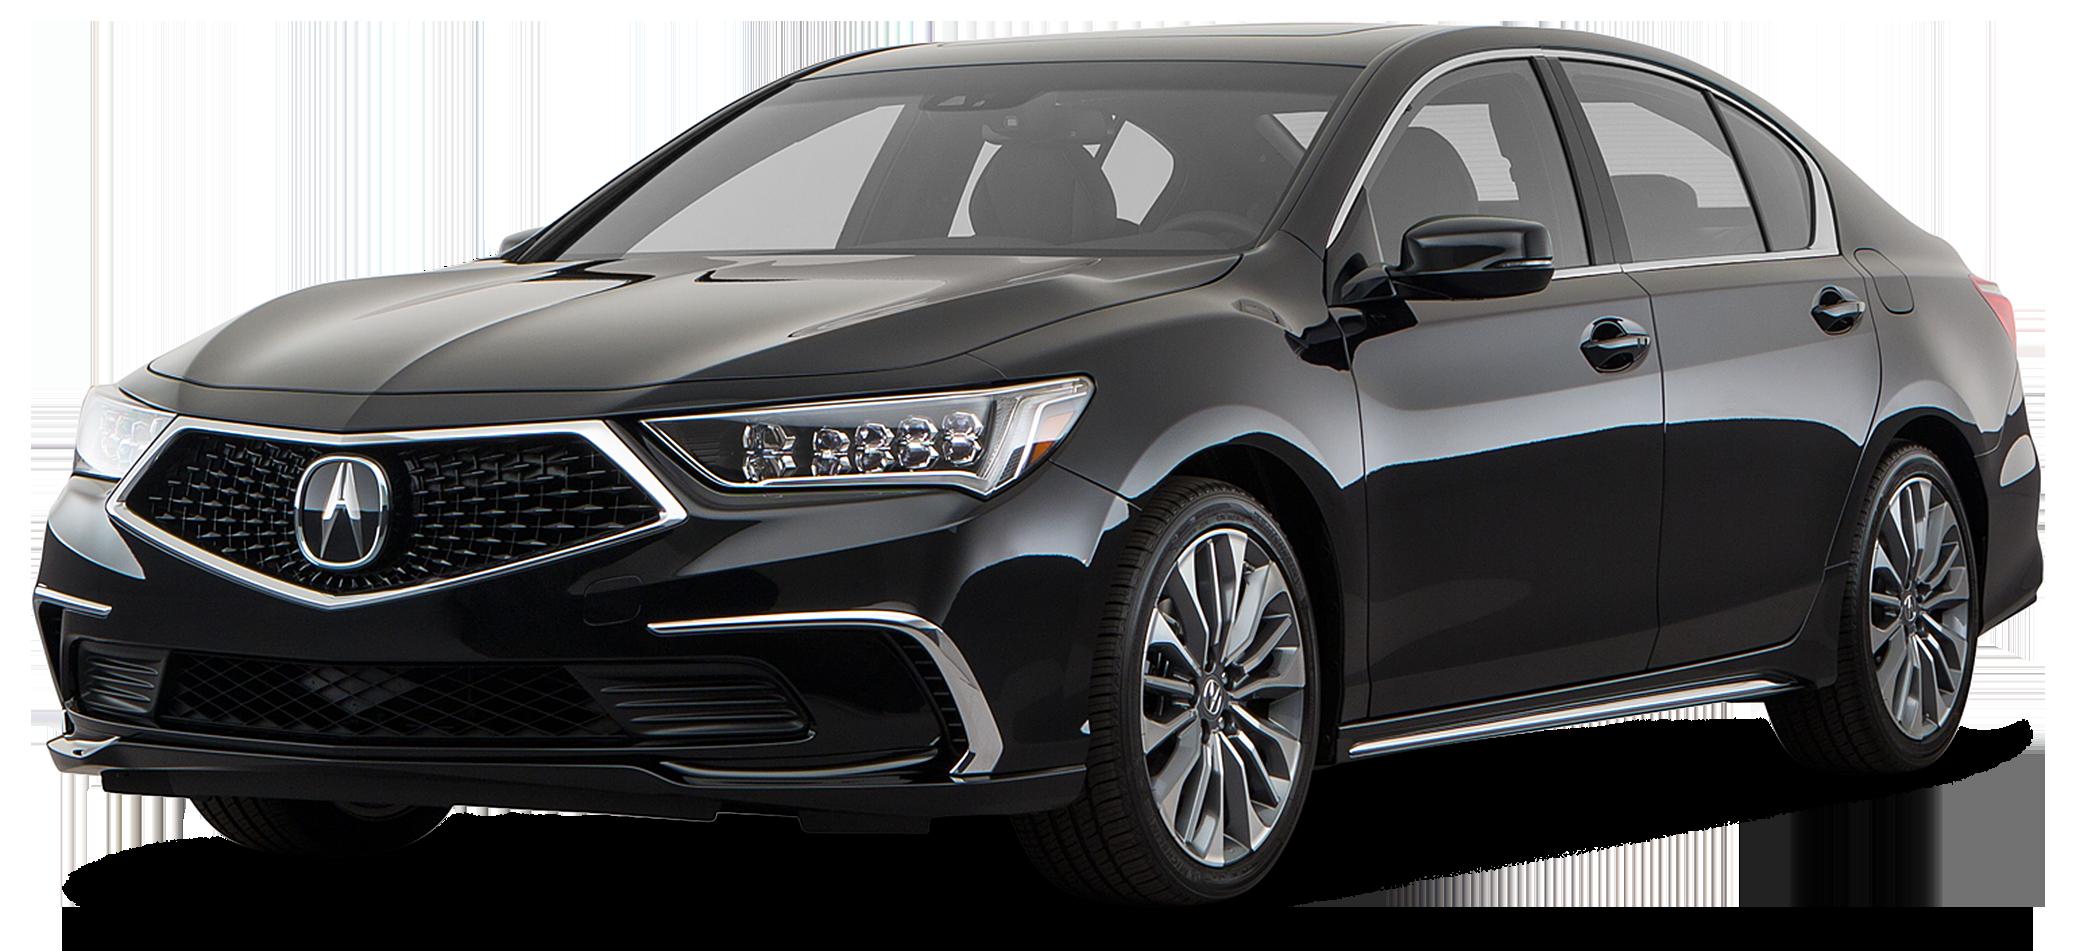 Fort Walton Beachs Tim Smith Acura New And Used Acura Cars - 2018 acura tl used